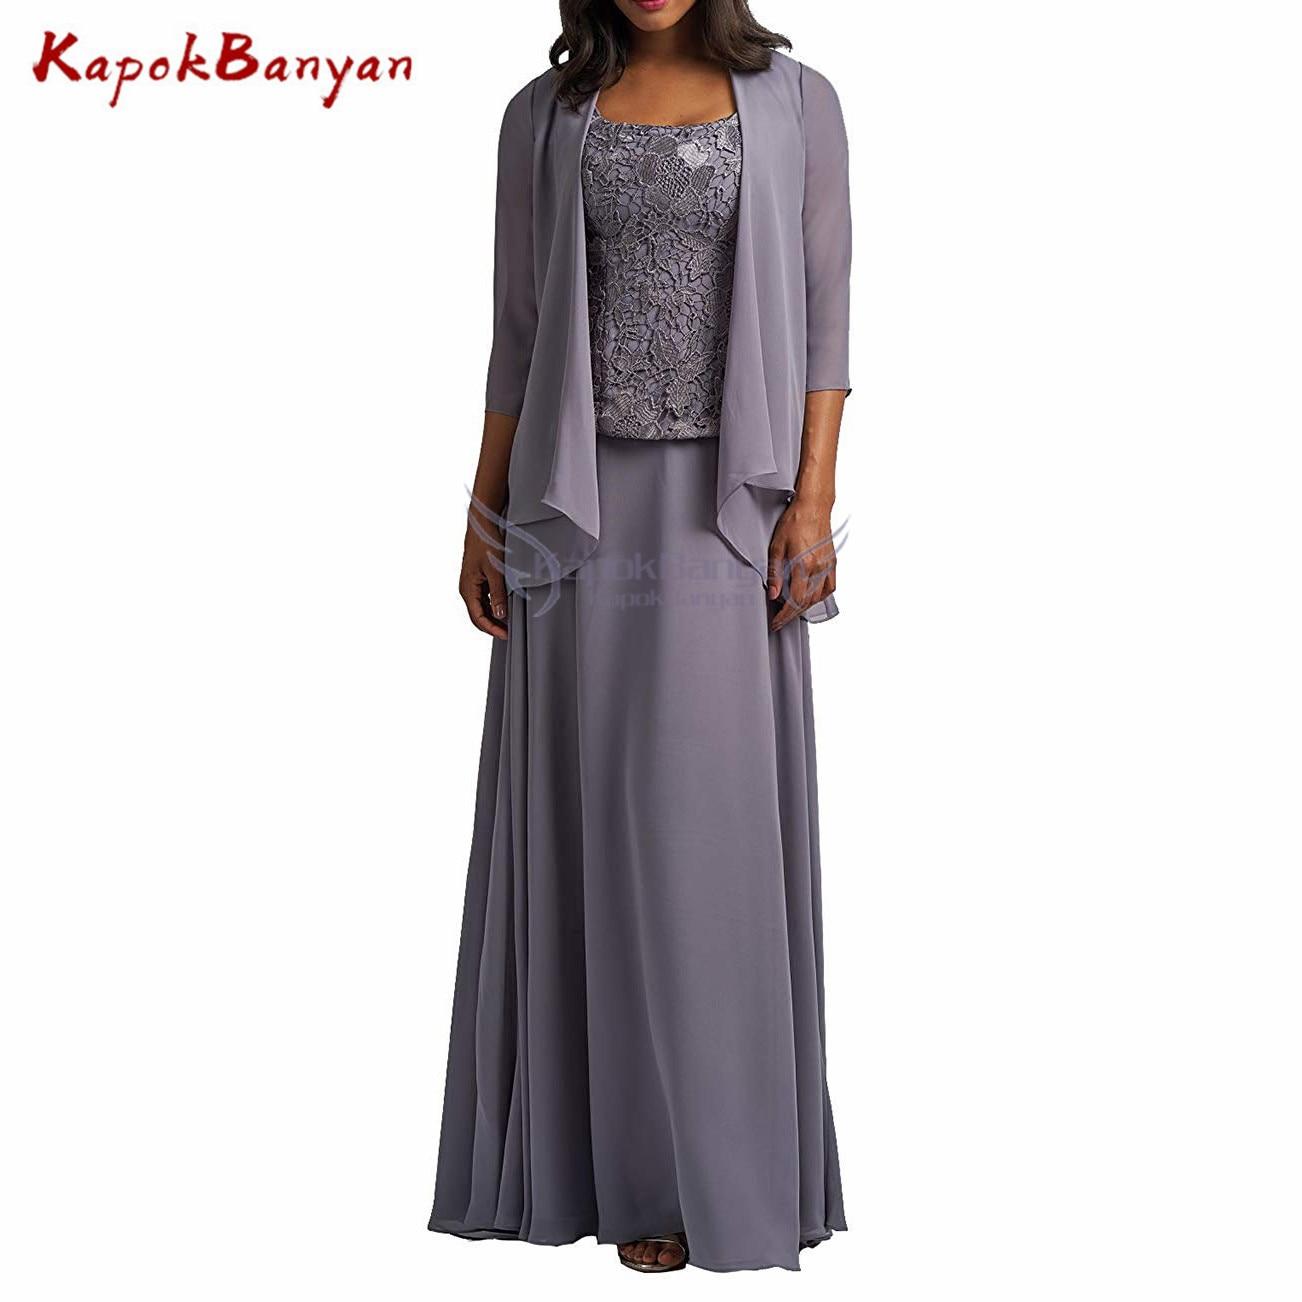 3 Pieces Mother Of Bride Dress With Chiffon Jacket A-line Lace Floor Length Mother Dress Vestidos De Fiesta De Noche